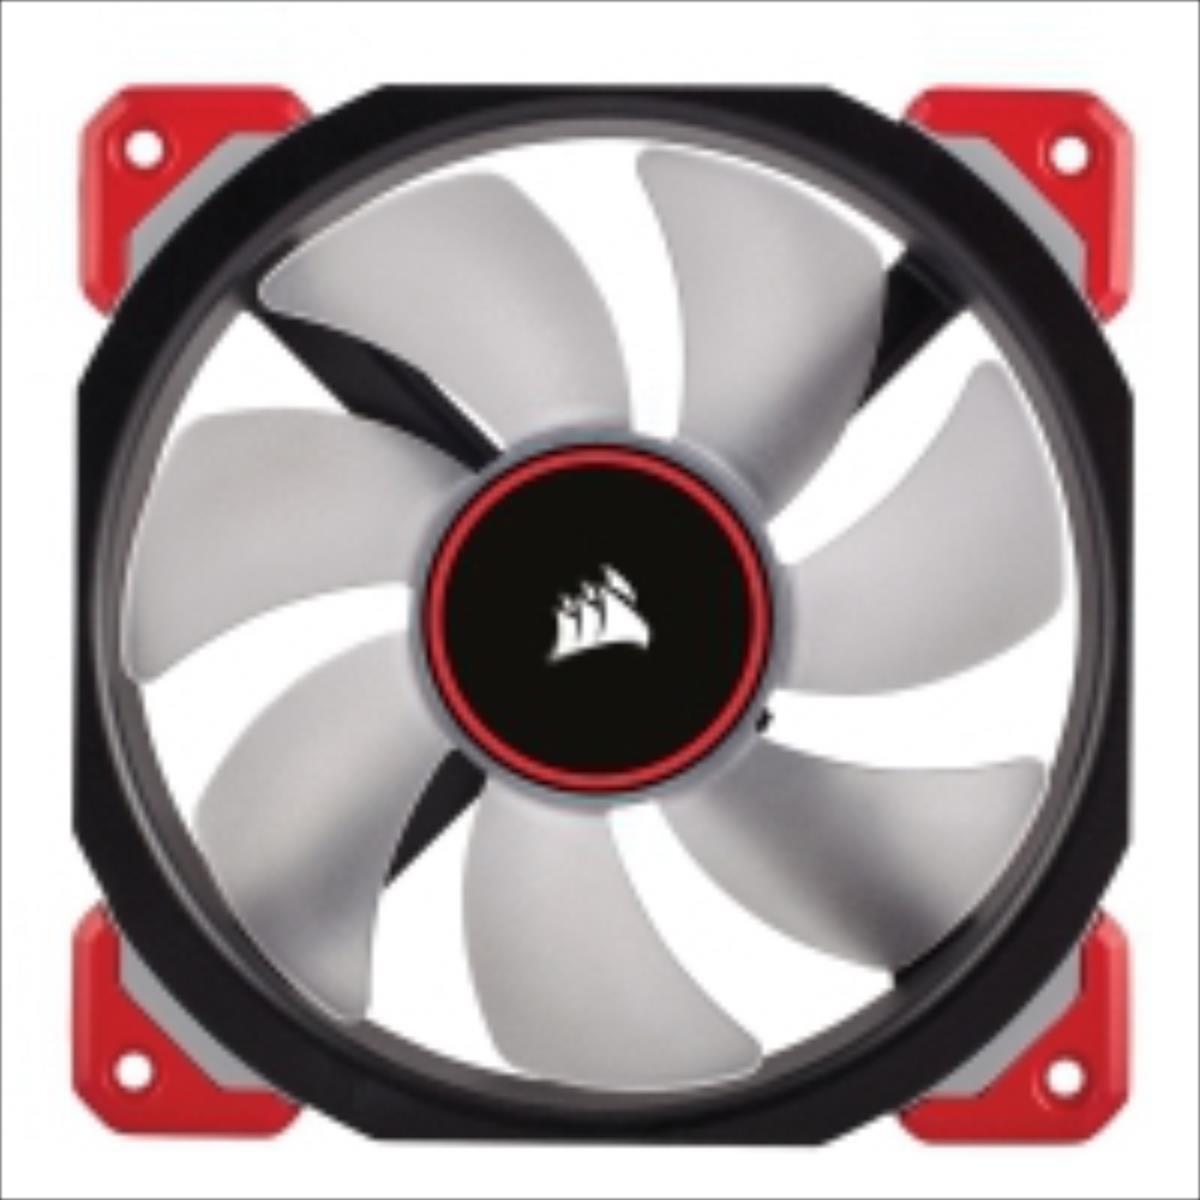 Corsair Air Series ML120 Magnetic Levitation Fan, LED red, 120mm dzesētājs, ventilators